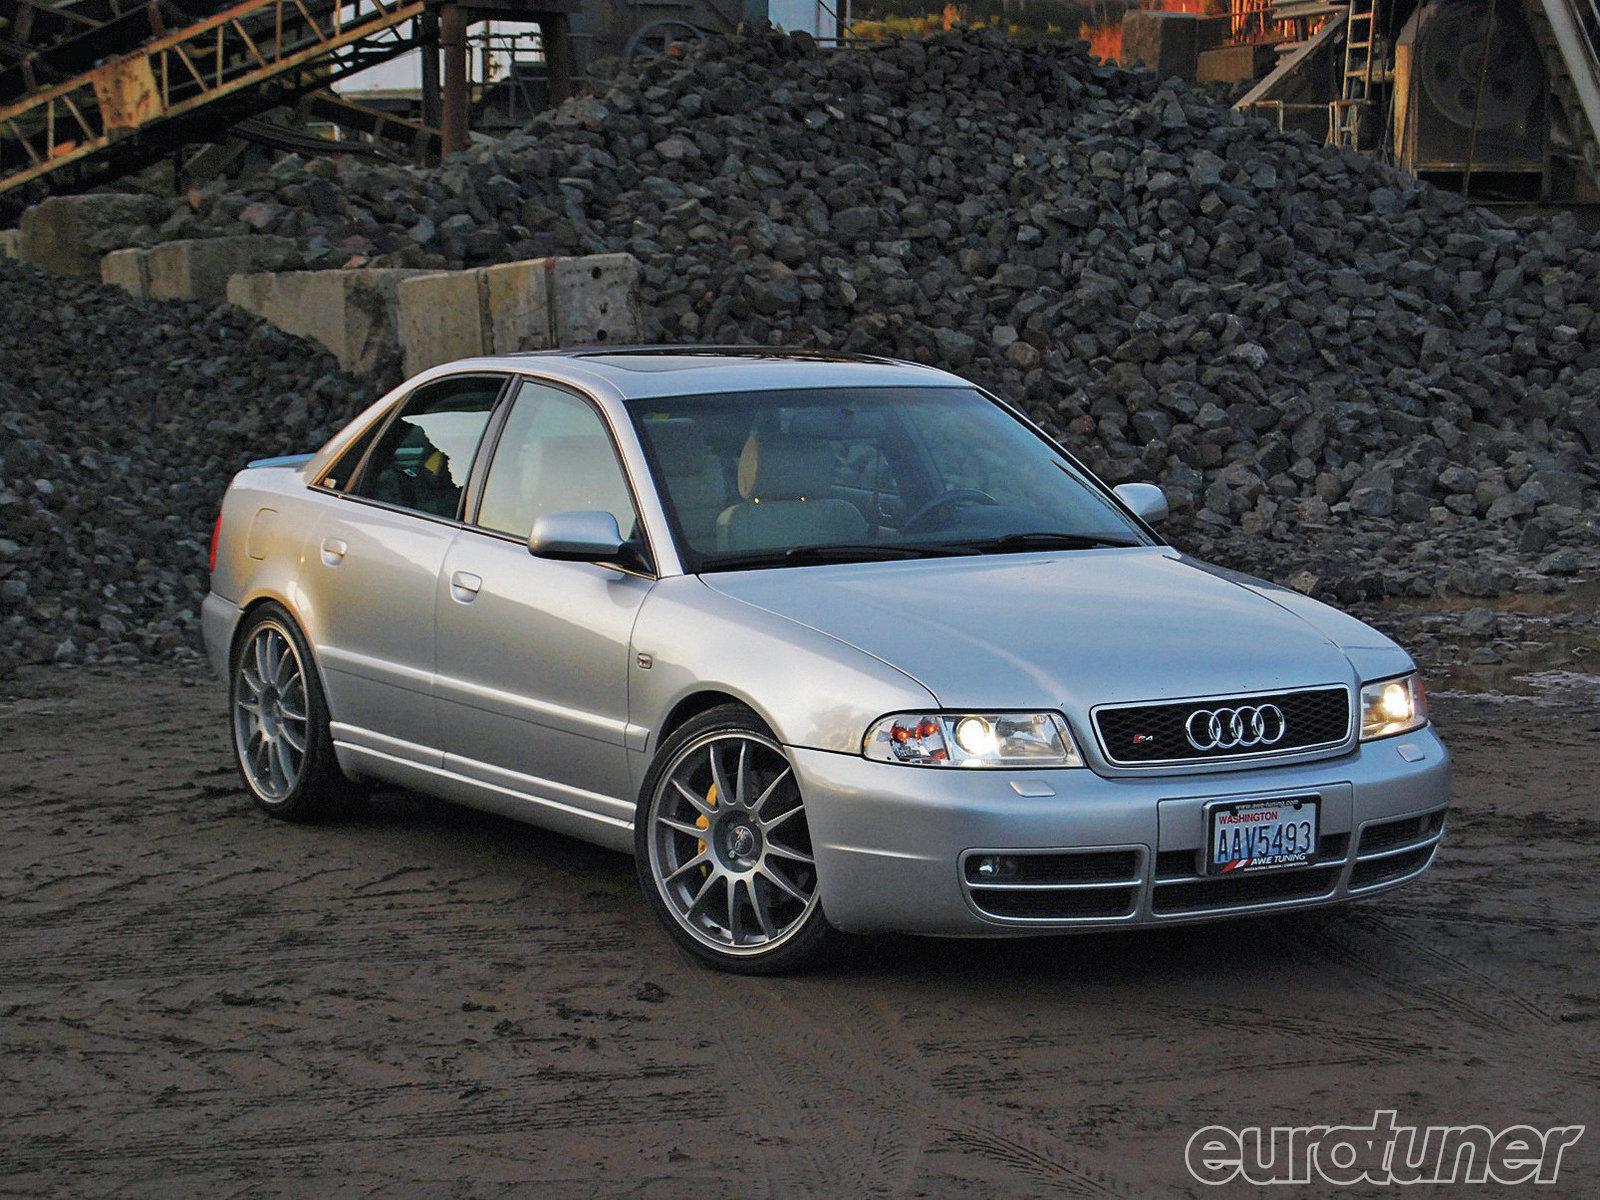 2001 Audi S4 Image 15